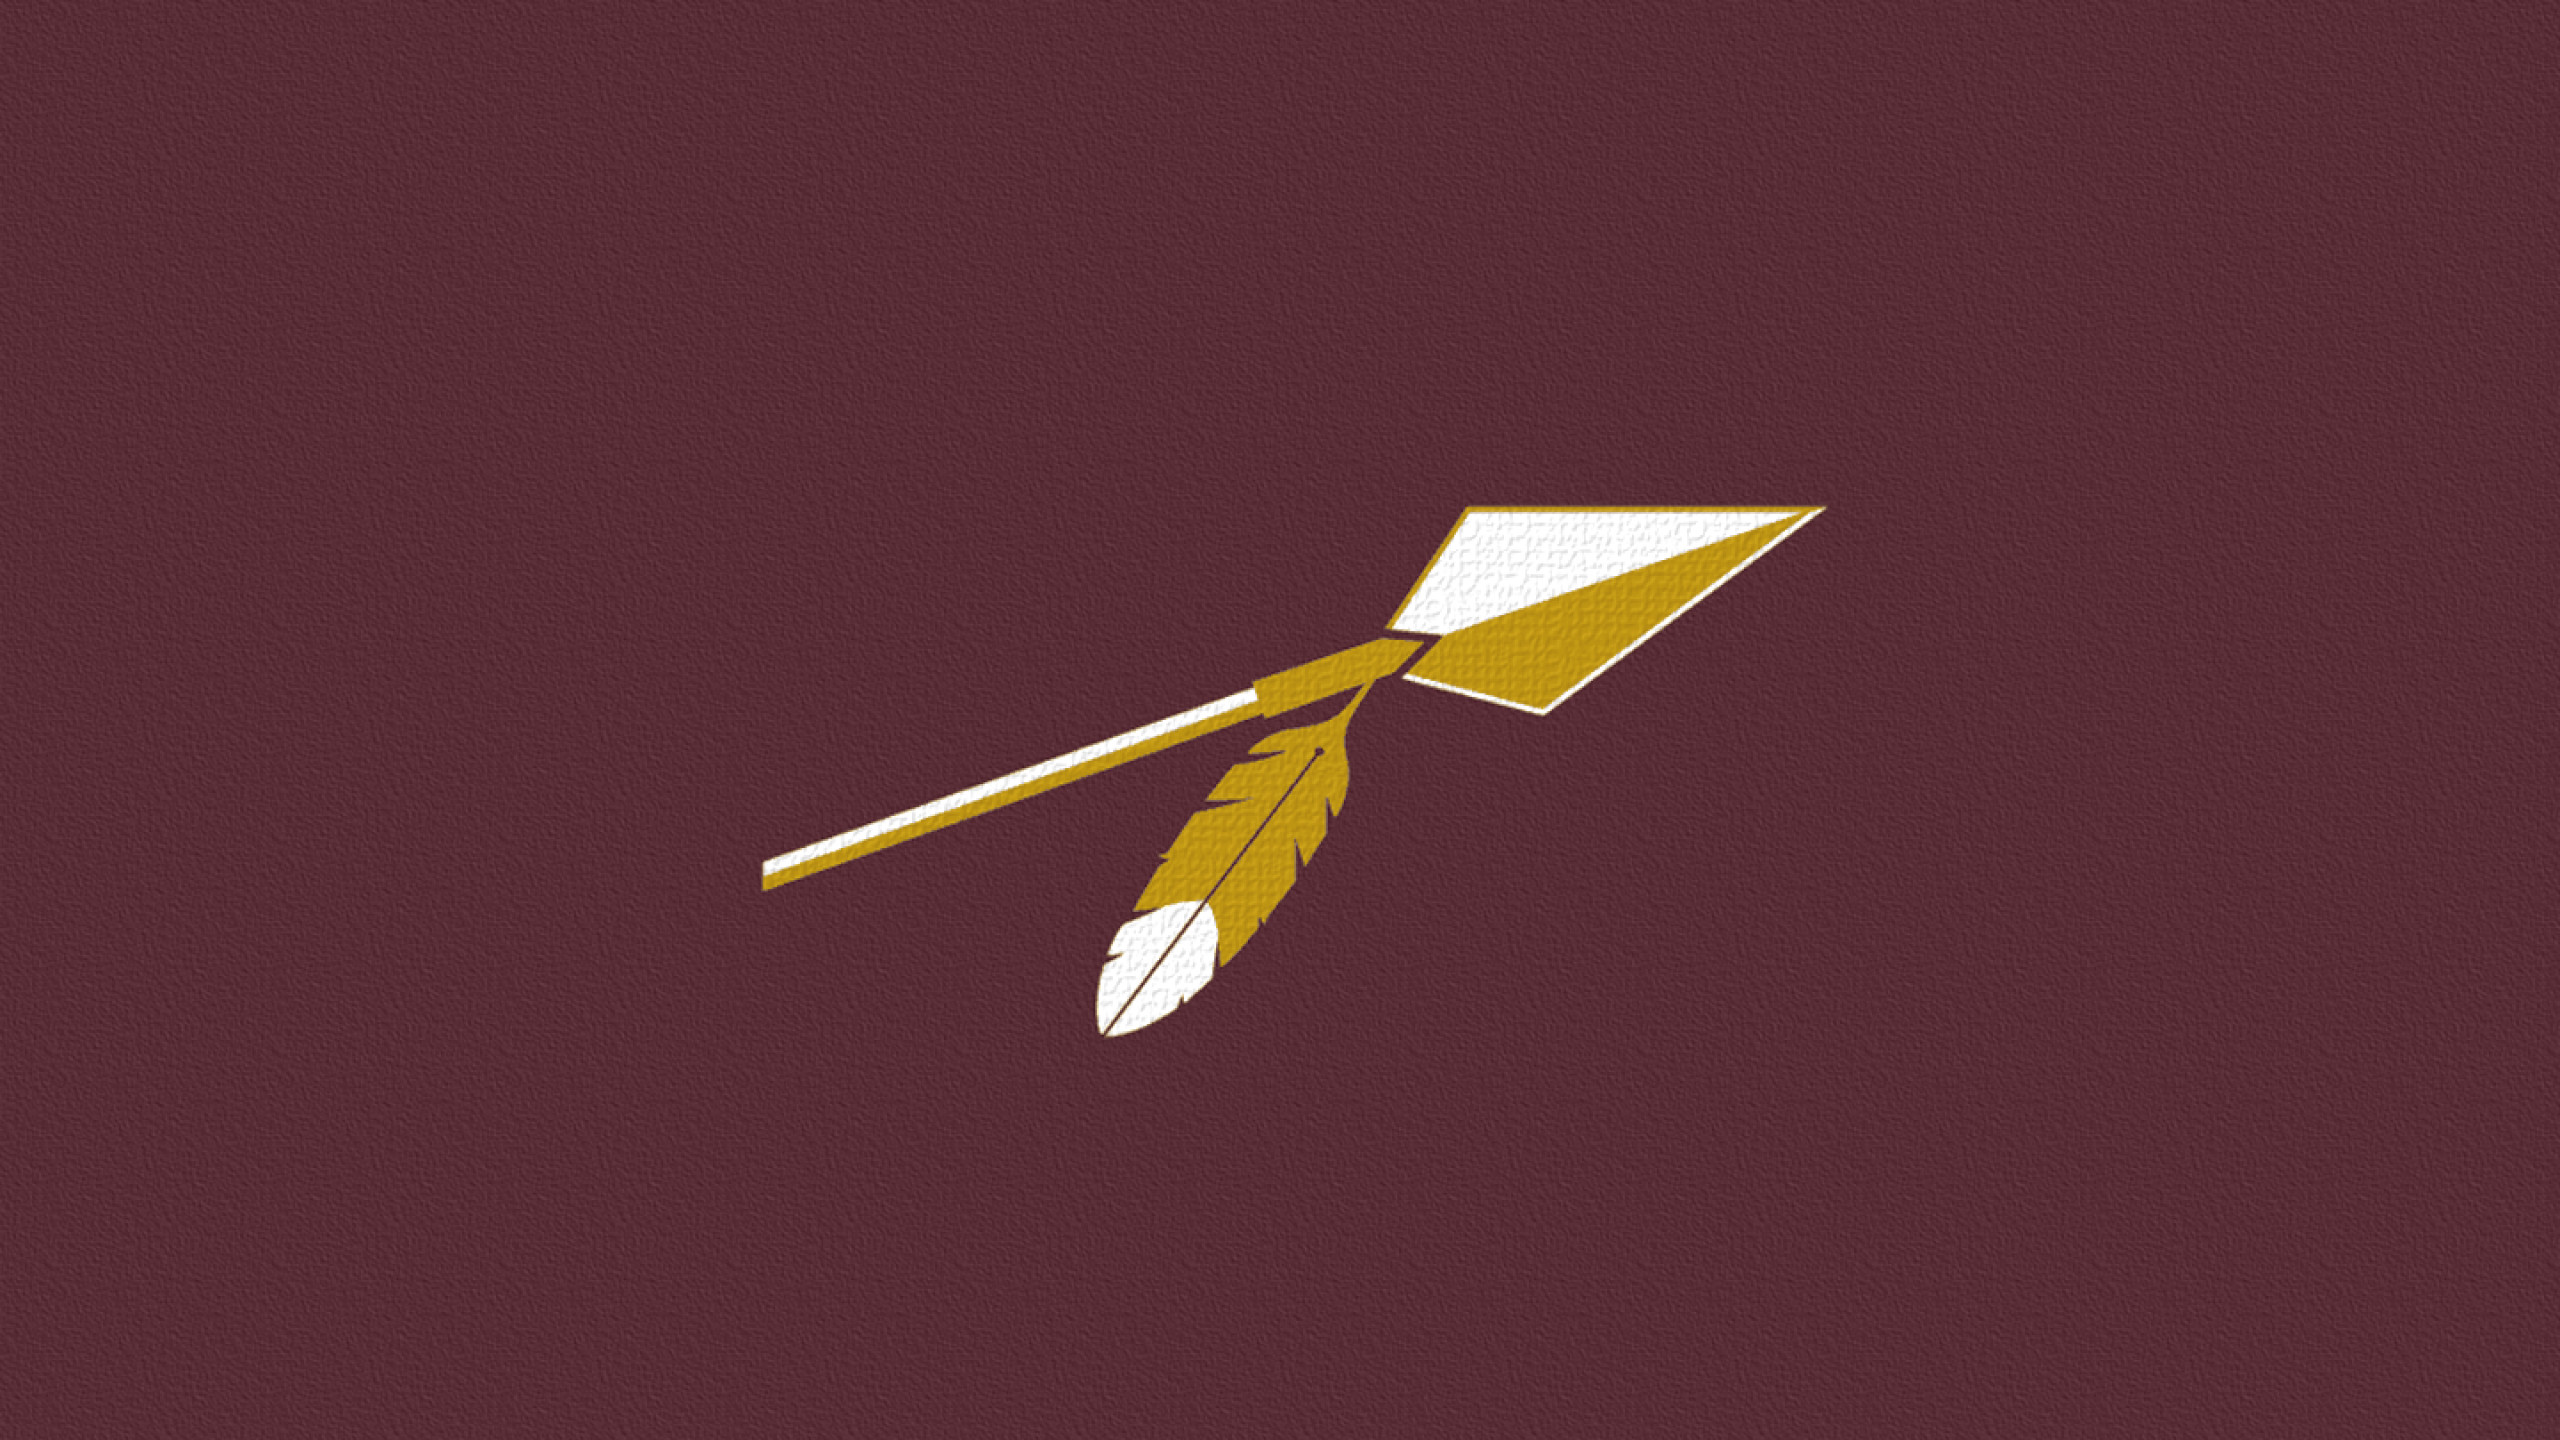 Washington Redskins Arrow